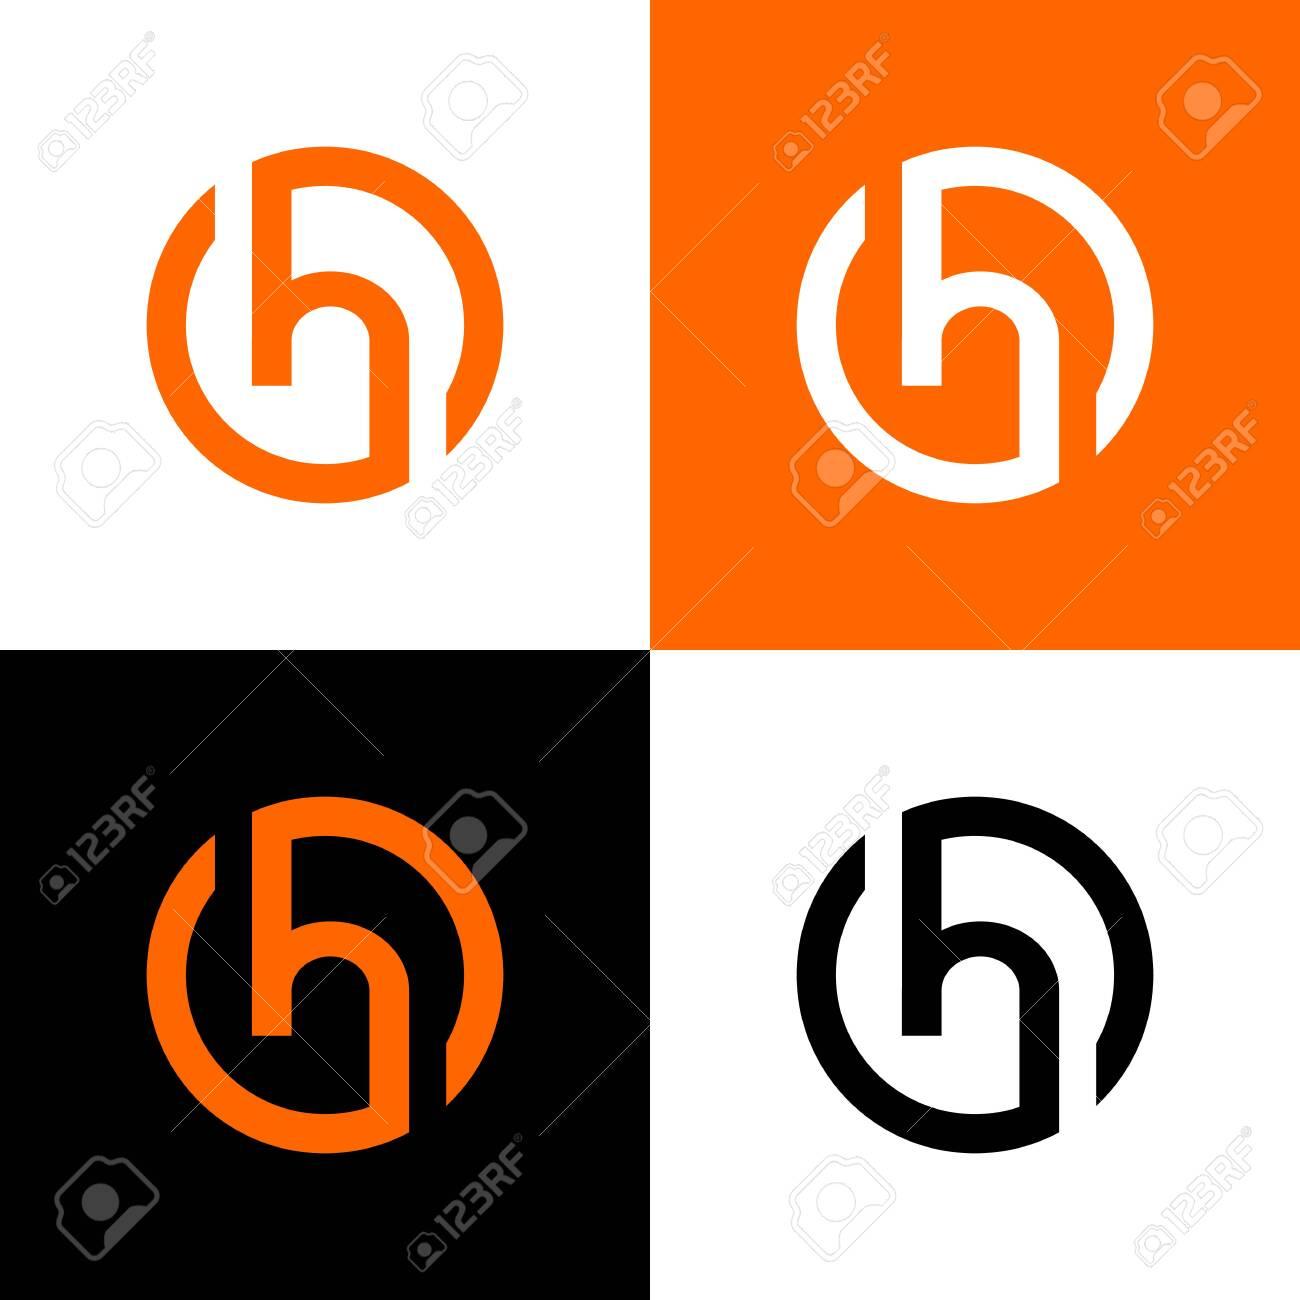 Circle letter h logo design template elements, vector illustration - 136622593